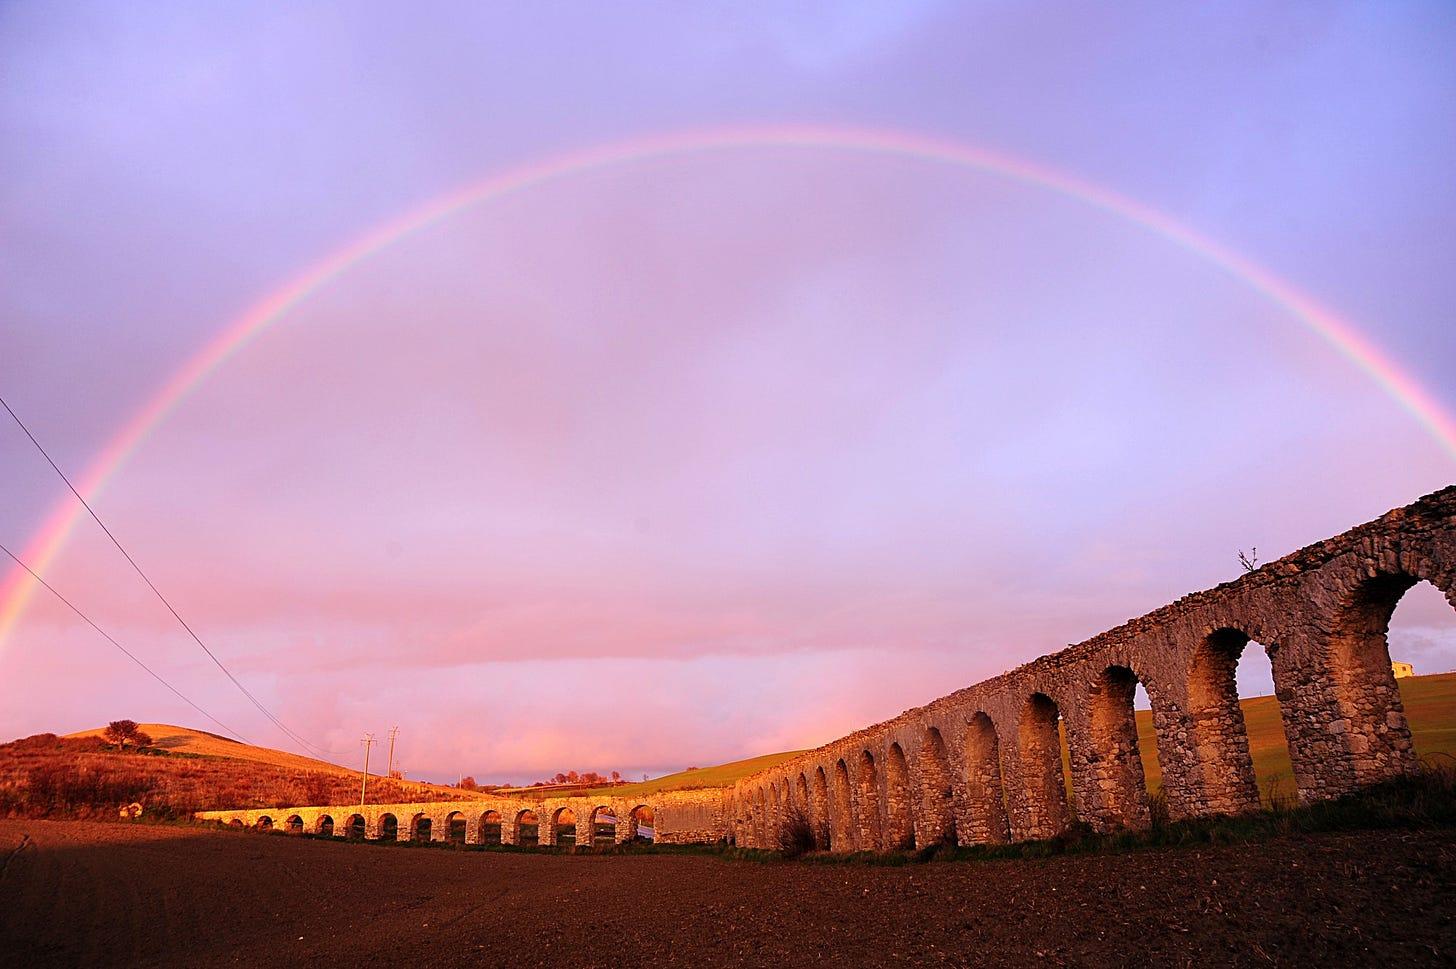 View of Roman Aqueduct at Monte Romano, Italy, Jan. 16, 2018